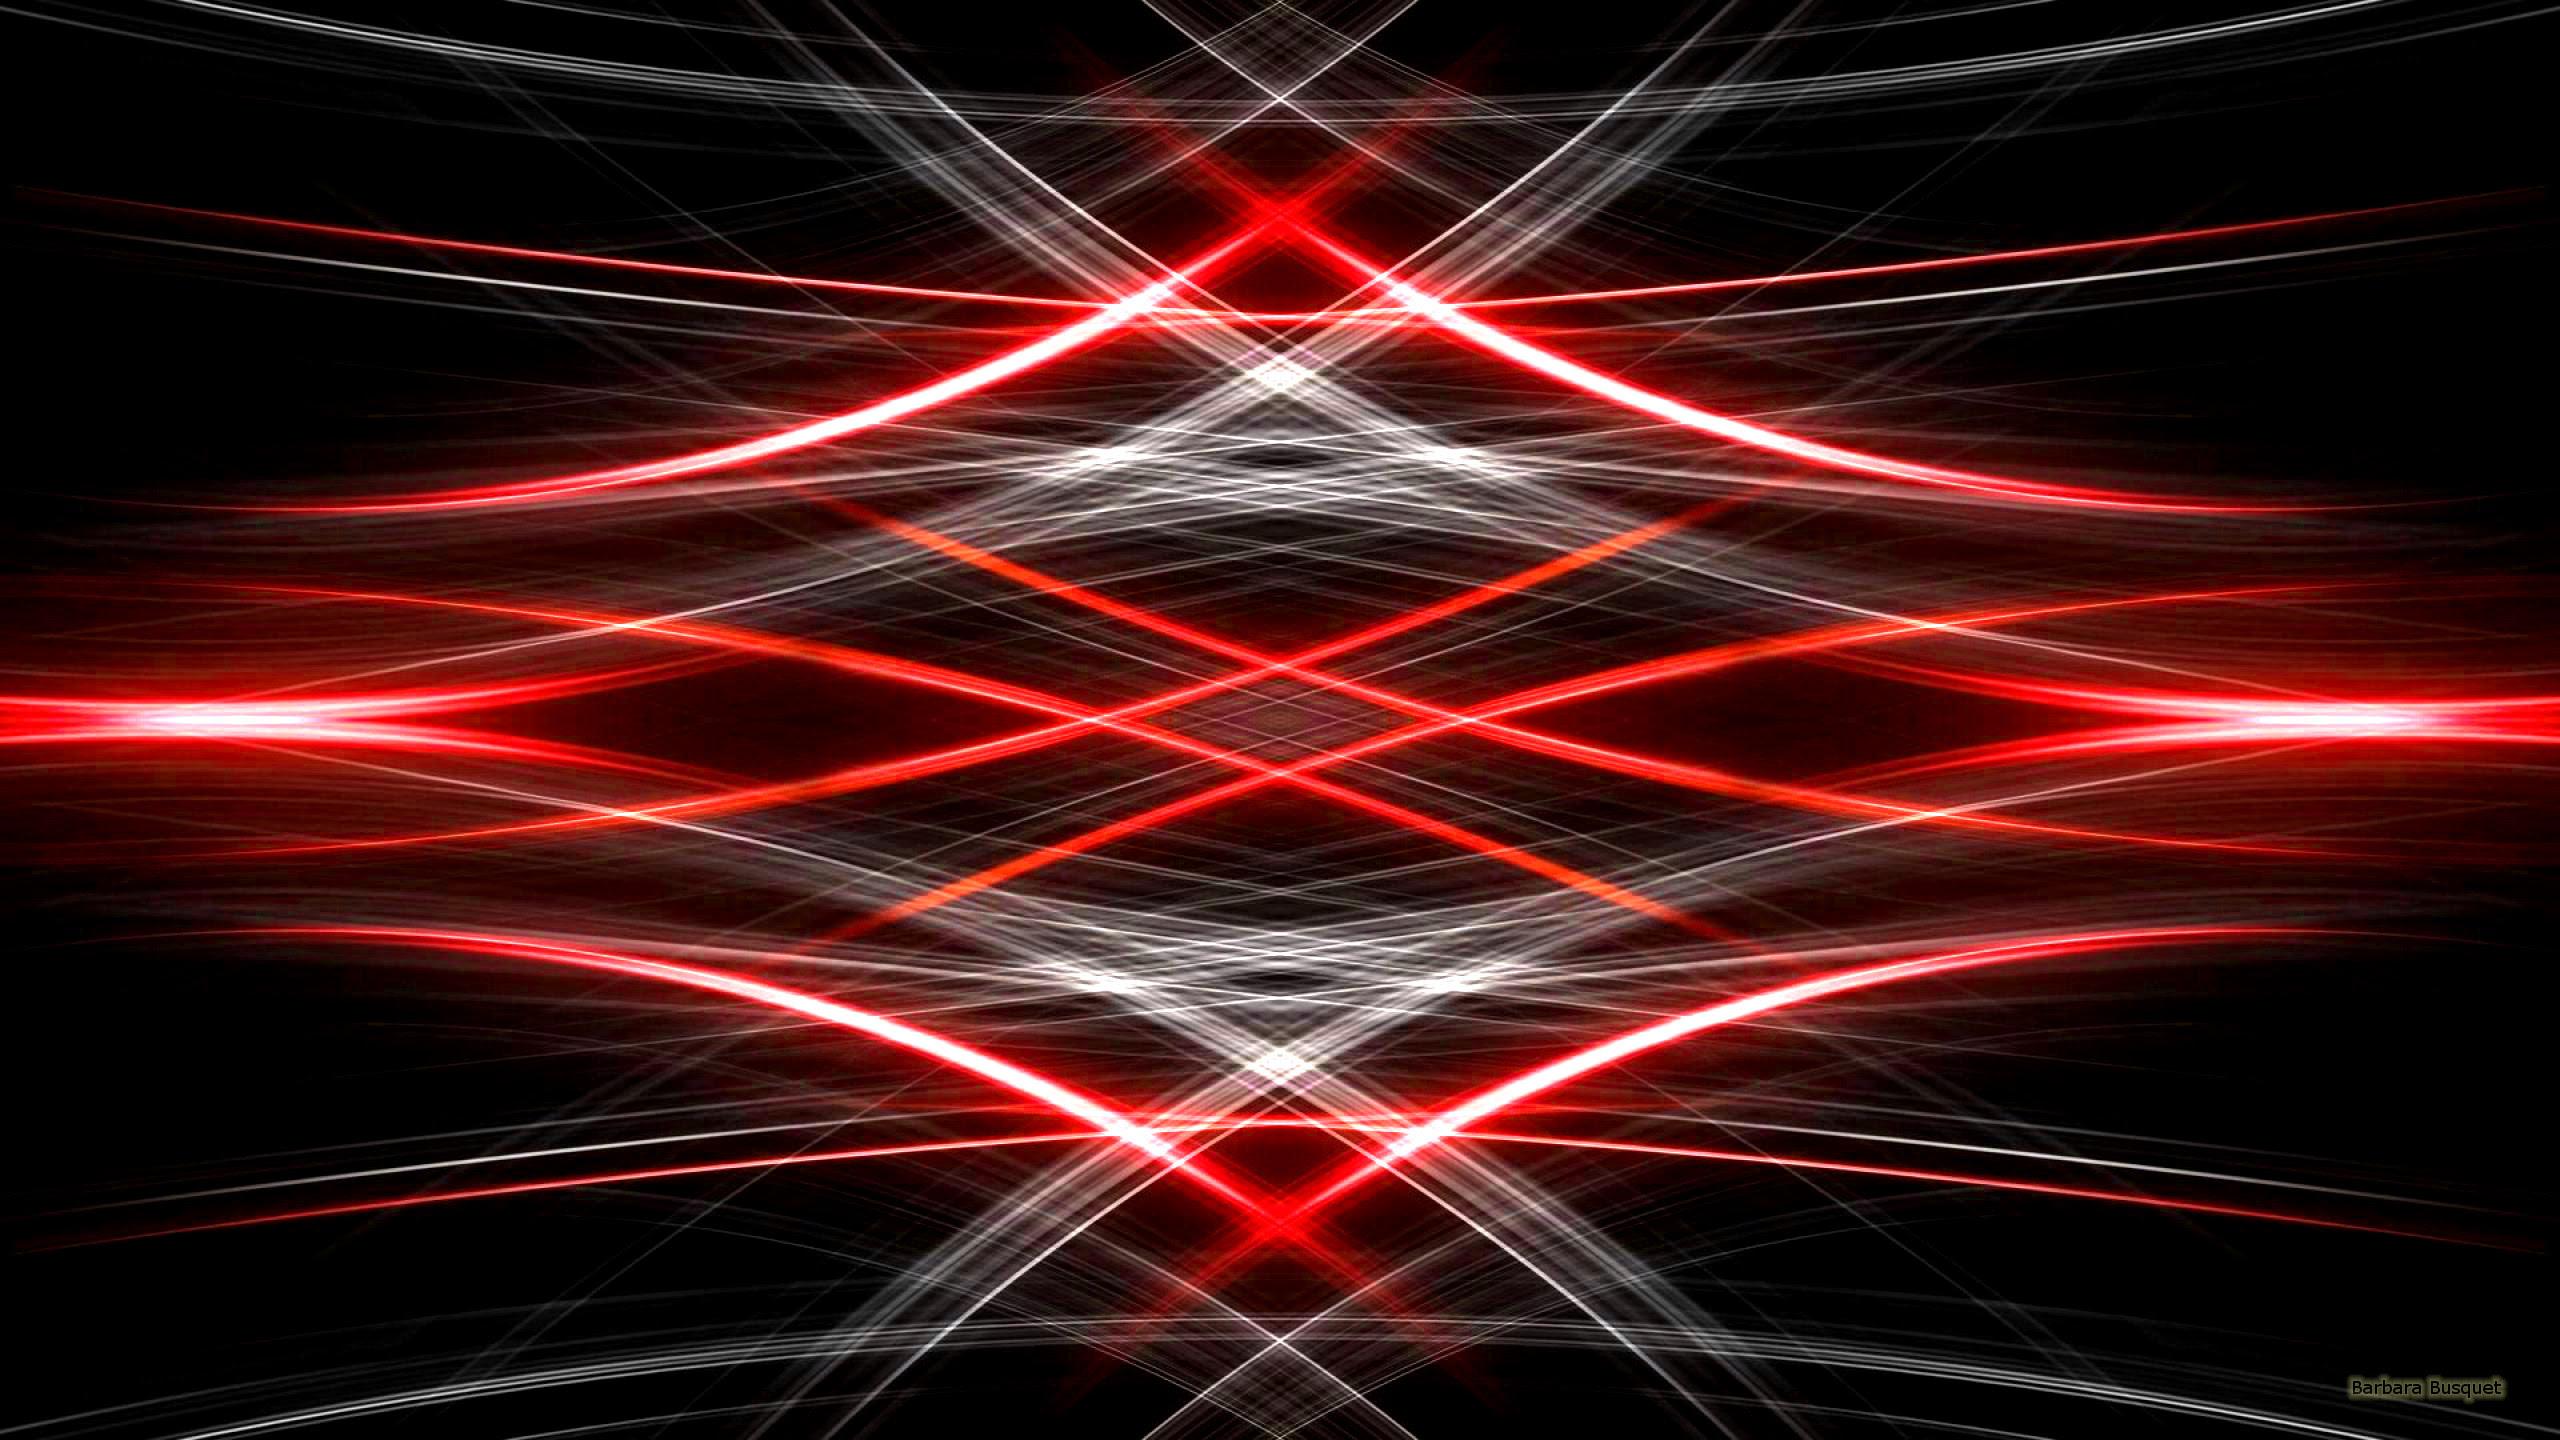 Red Black White Wallpaper 66 Images